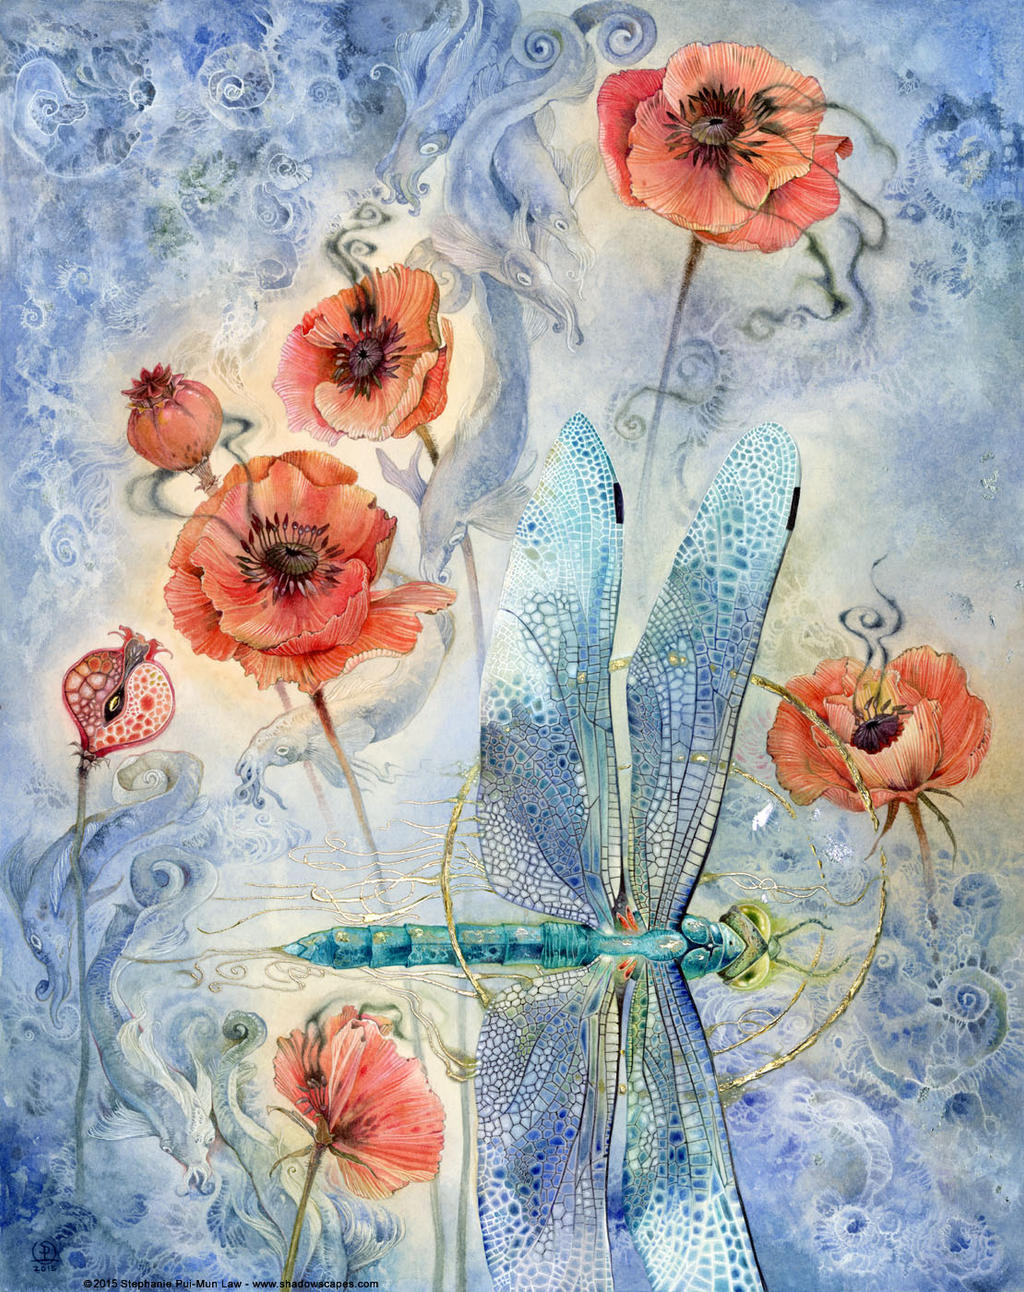 When Flowers Dream II by puimun